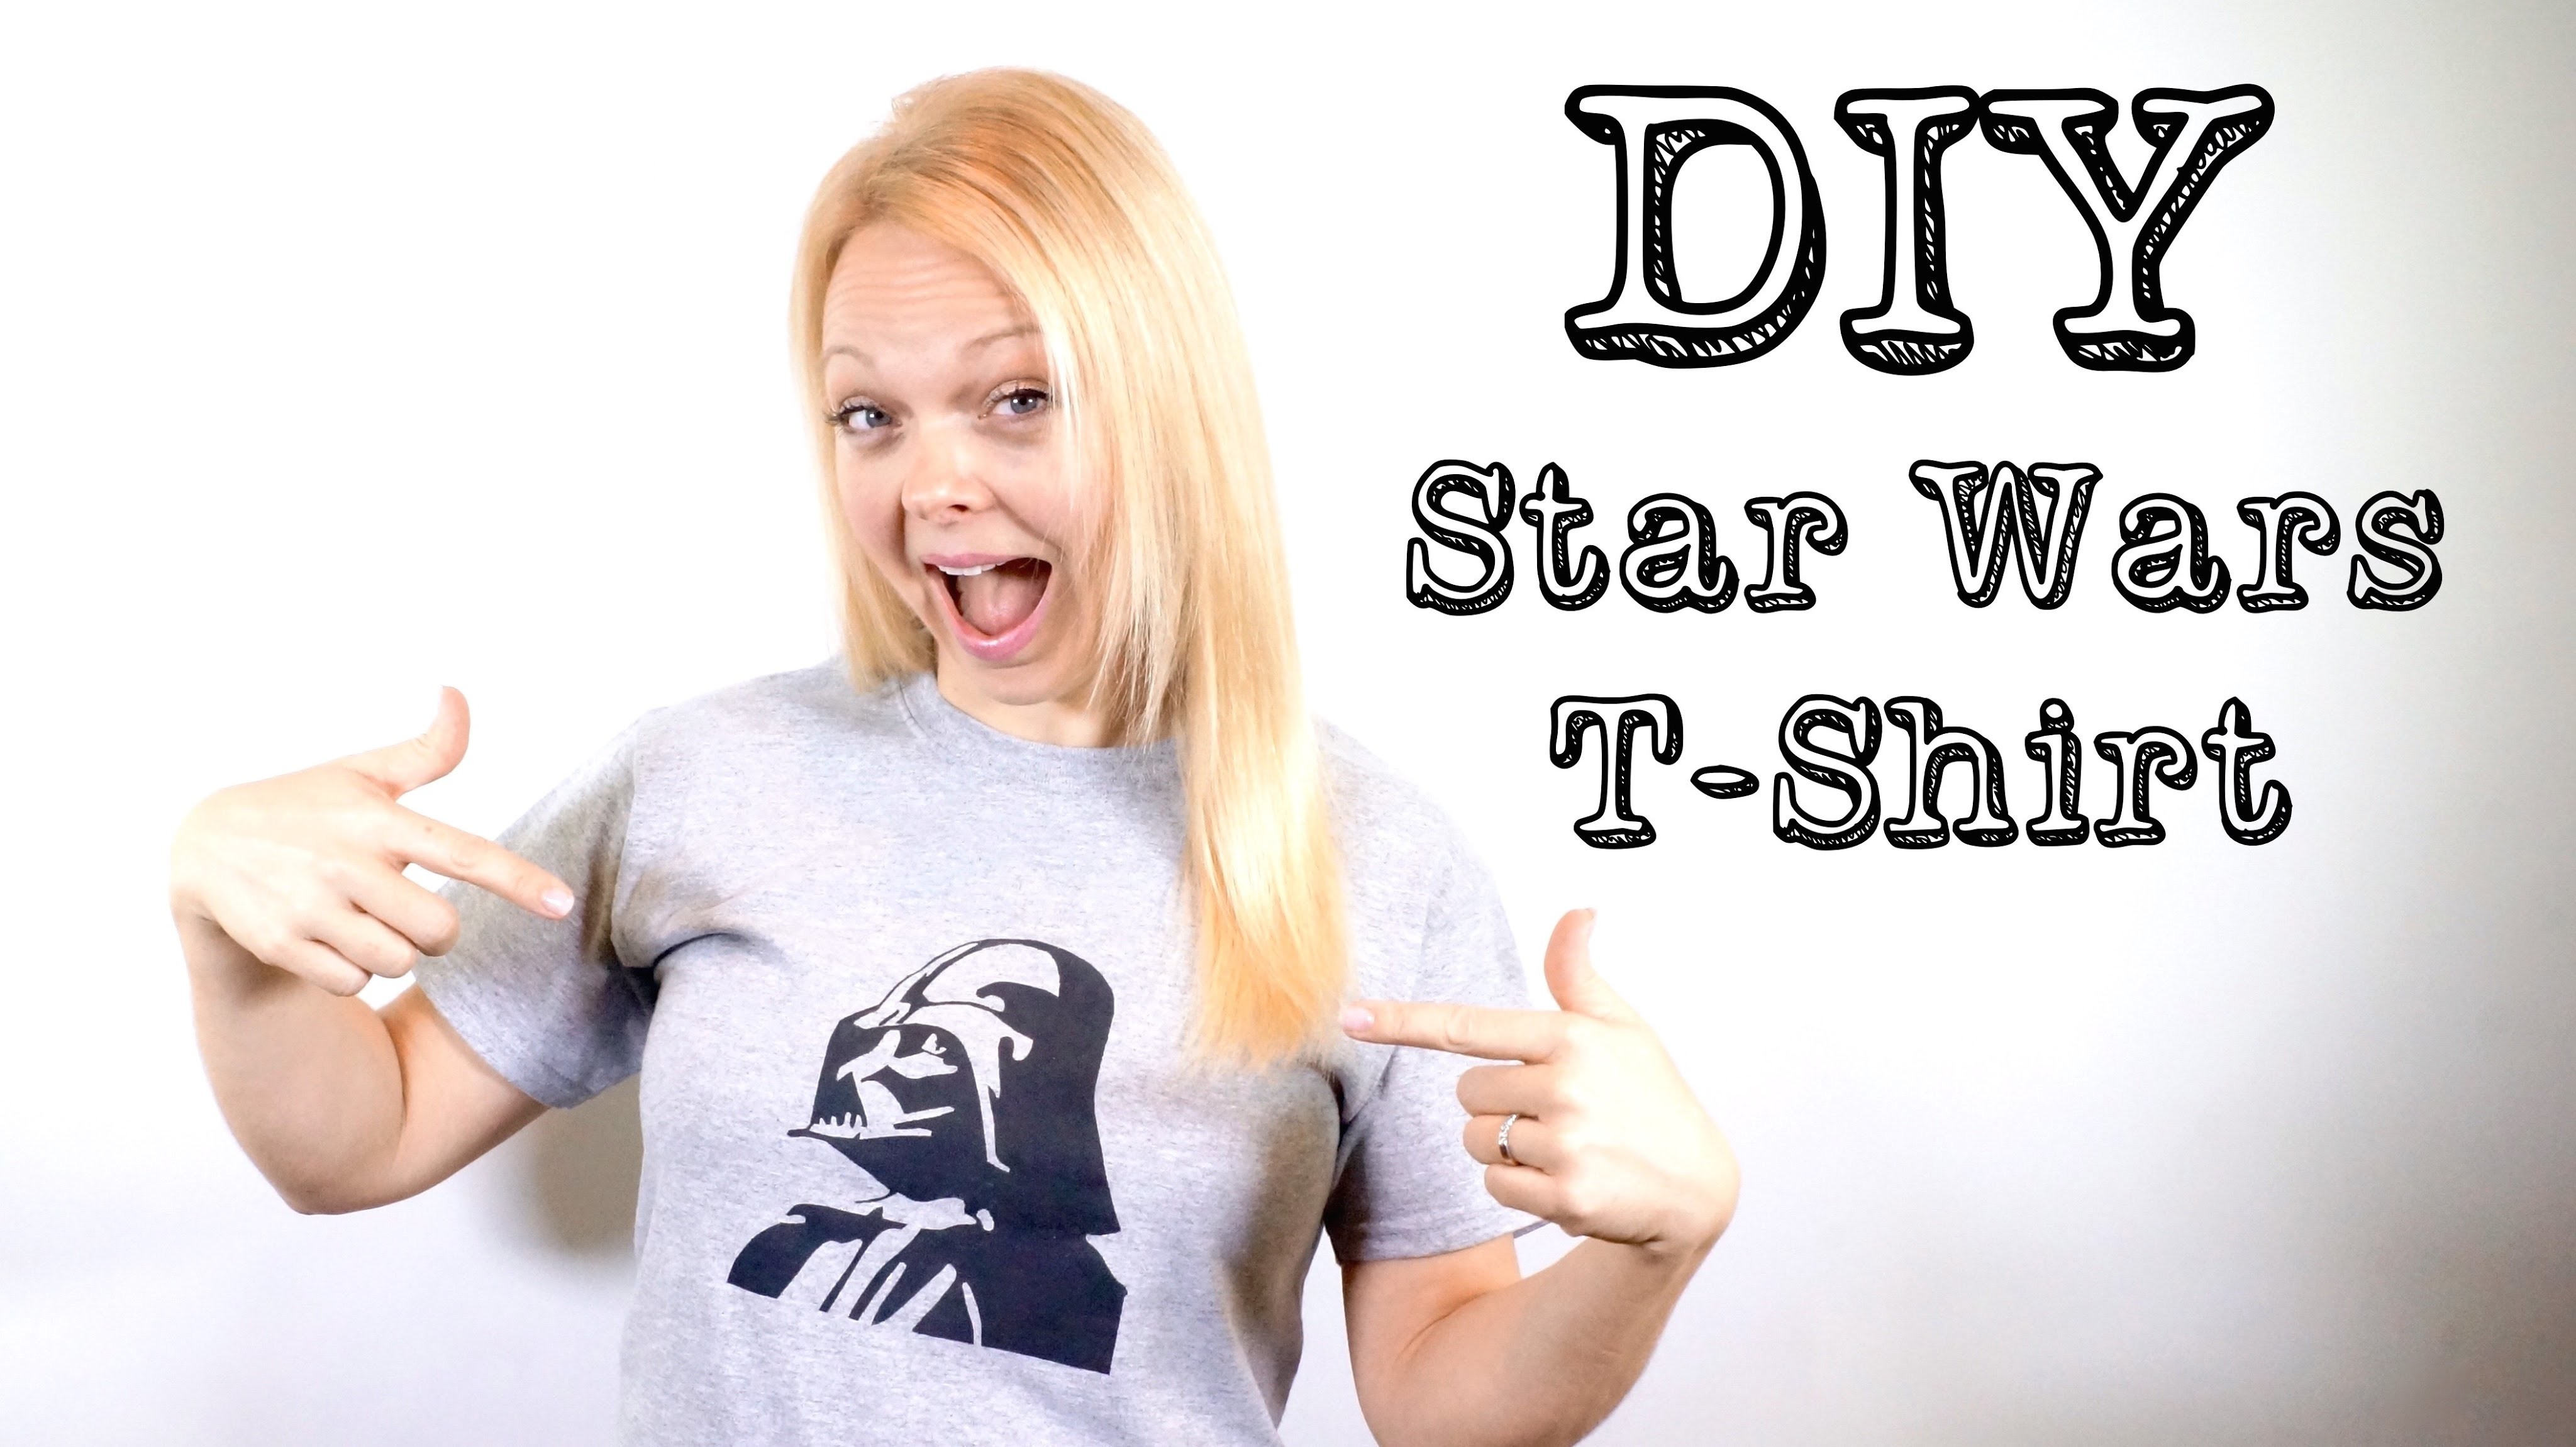 DIY Darth Vader. Star Wars T-shirt